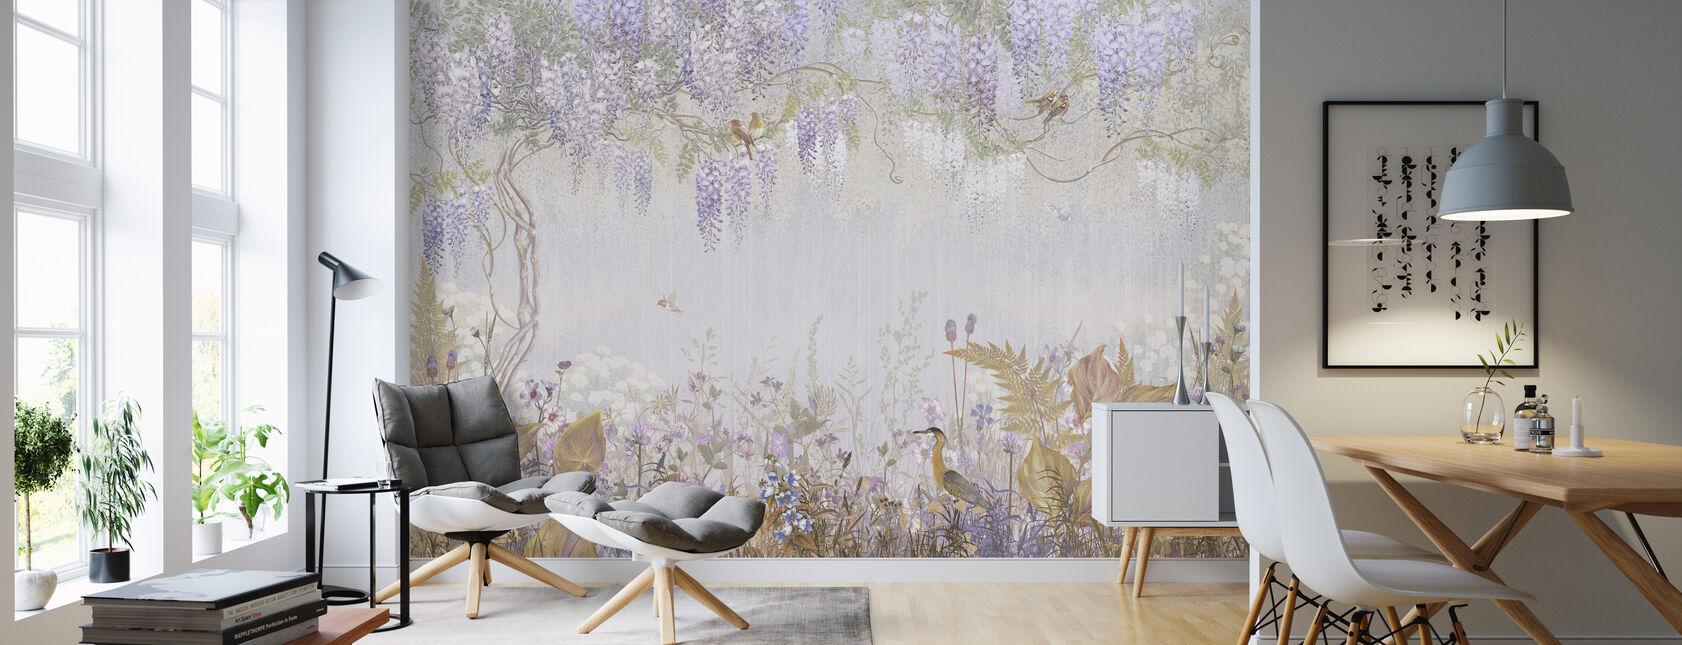 Purple Misty Forest - Wallpaper - Living Room